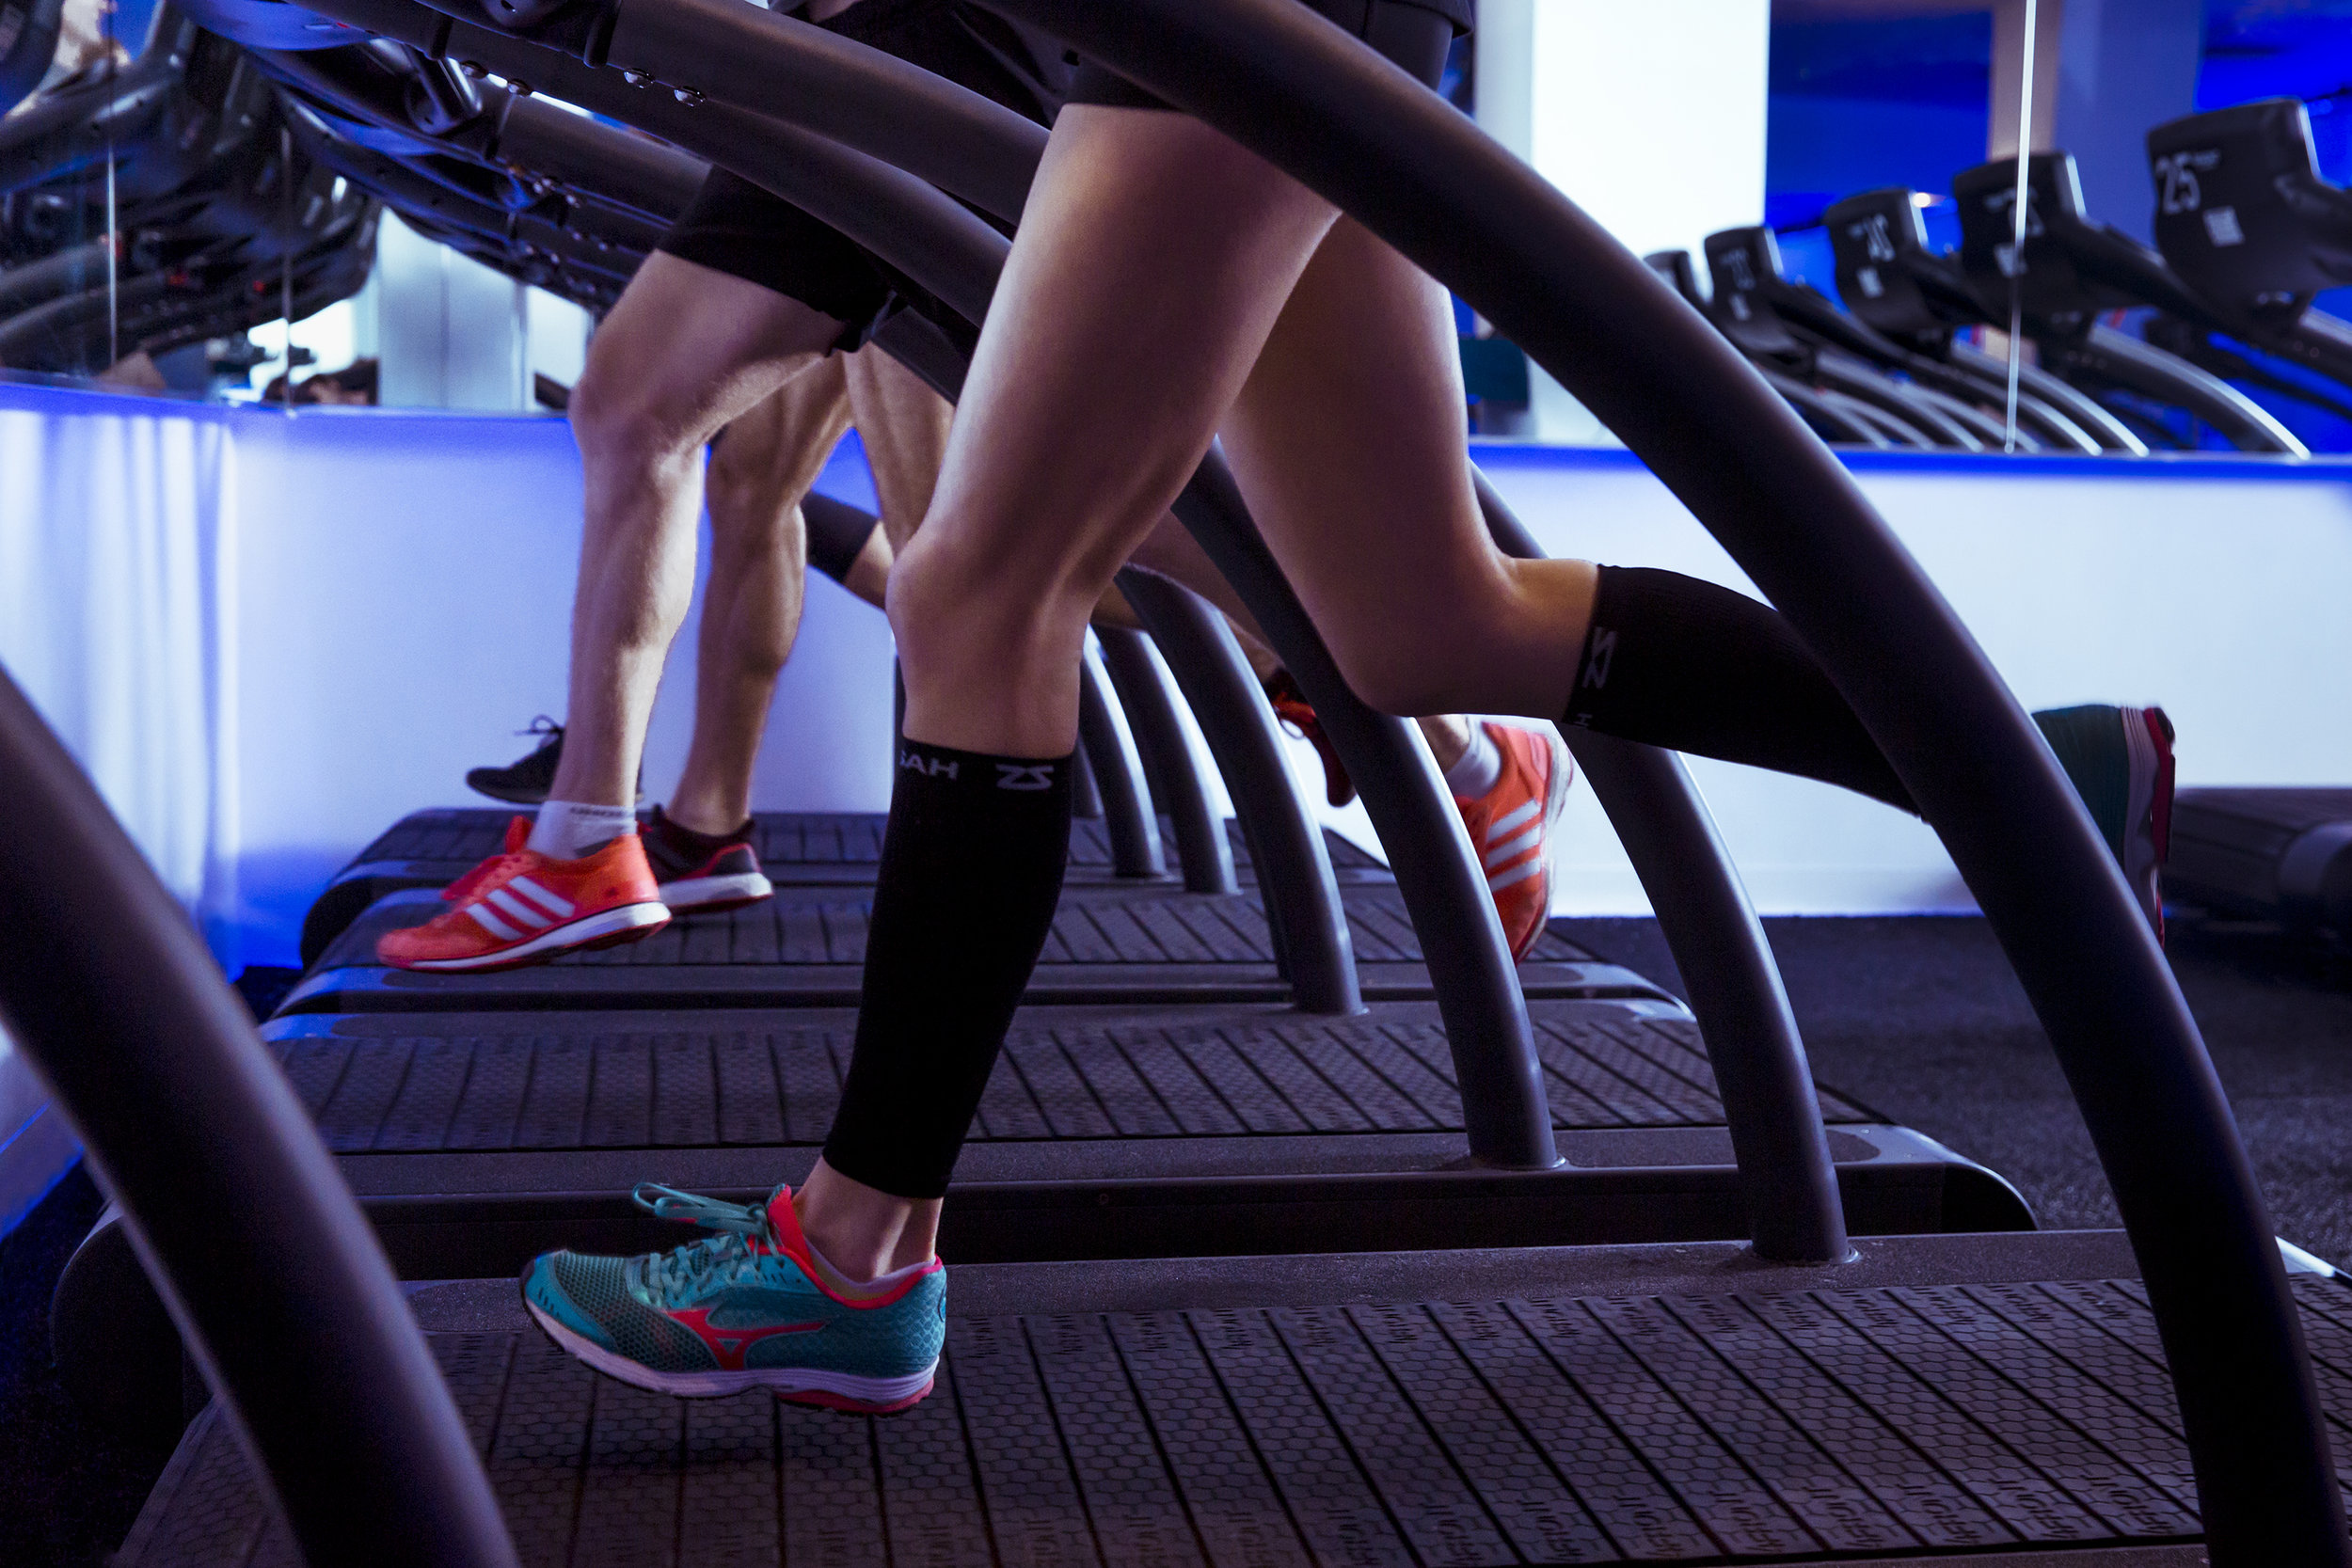 Mile High Run Club New York City Fitness Travel Lifestyle www.annakooiman.com Anna Kooiman treadmills cu MHRC